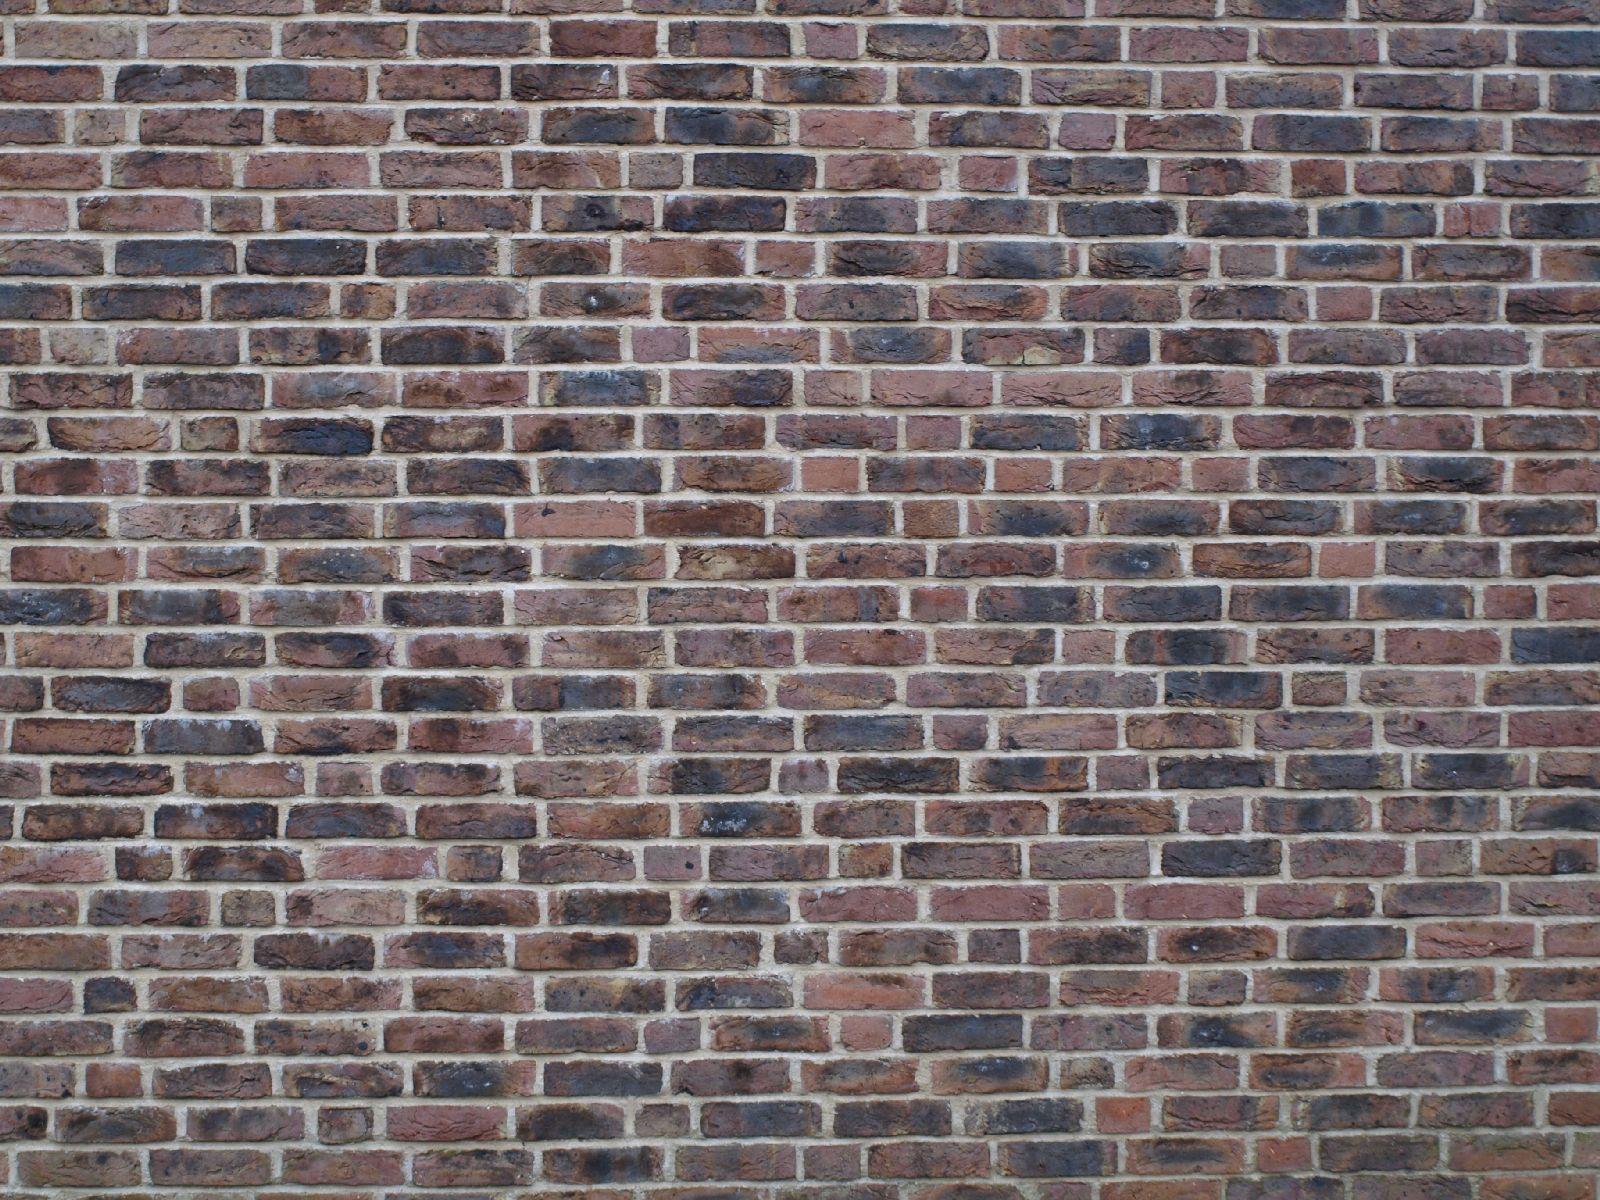 Wand-Mauerwerk-Backstein_Textur_A_P1018660